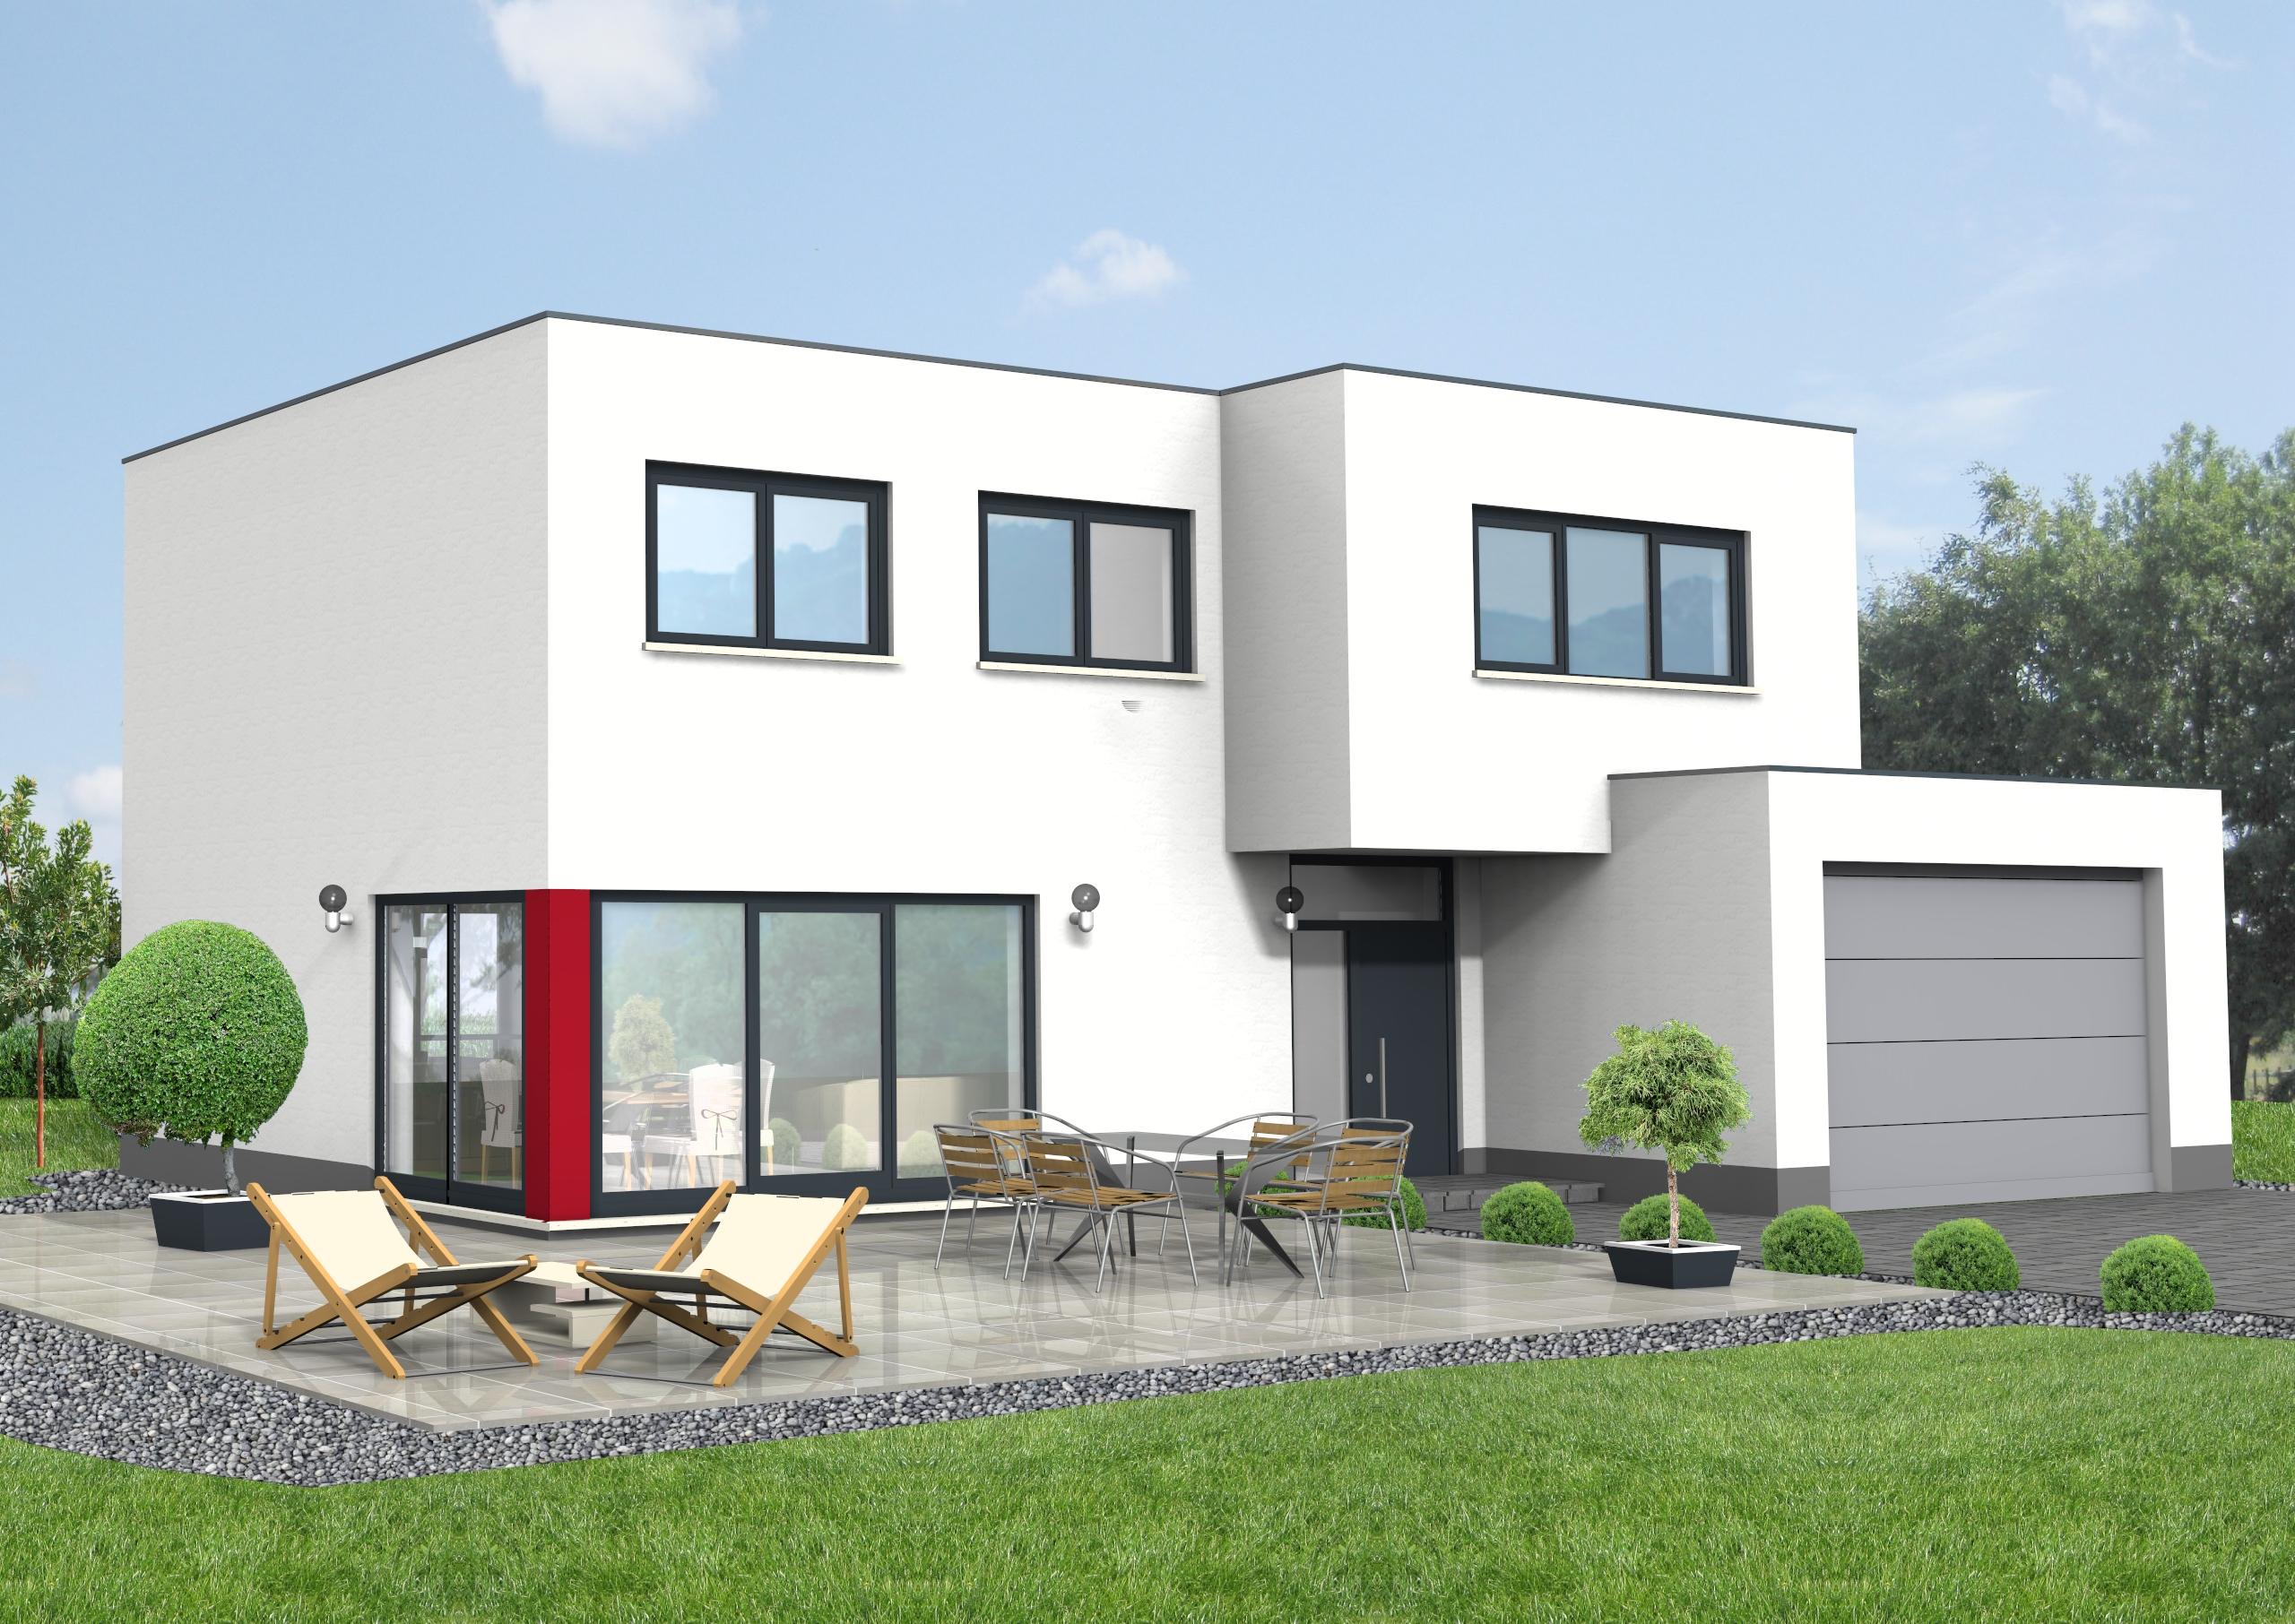 Emejing Cube Haus Bauen Pictures - Kosherelsalvador.com ...